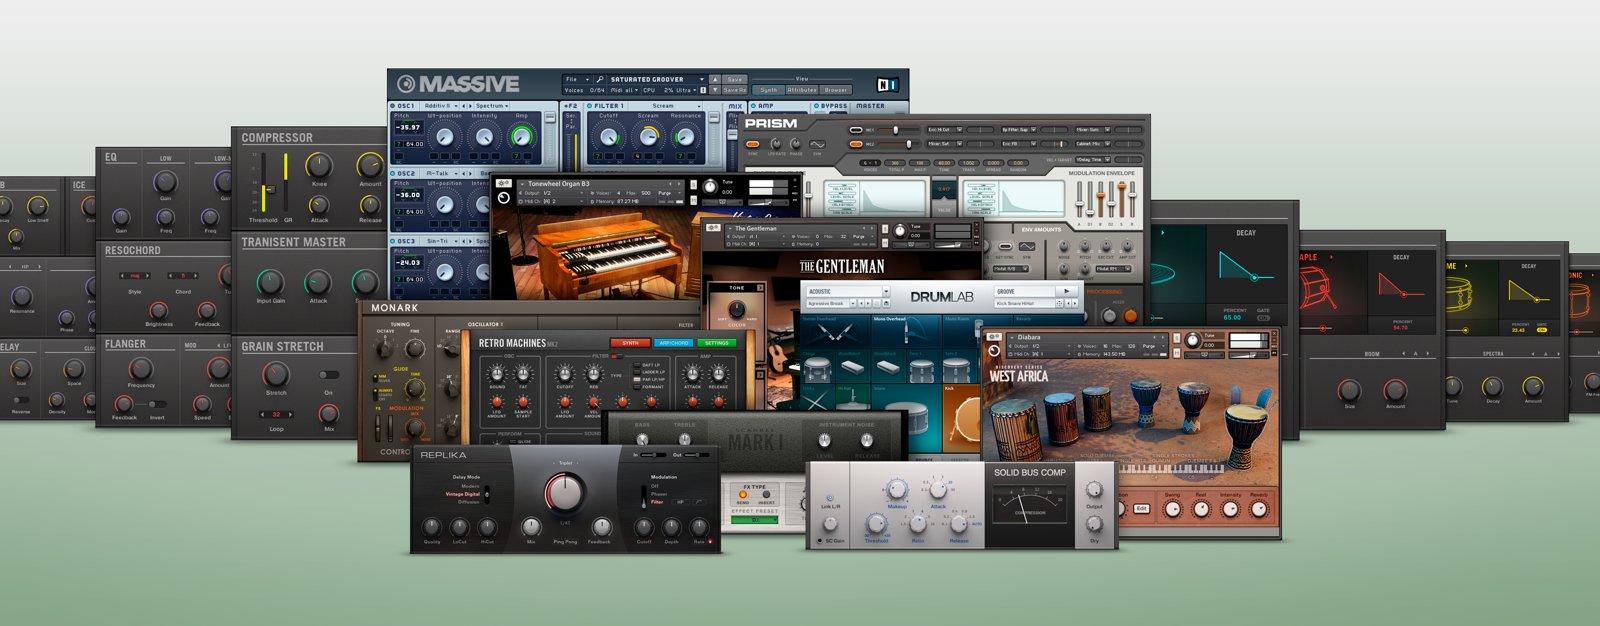 img-ce-full-maschine-jam_overview_03-supreme-sound-c5dc61d39cbc3adbff789c12389cb749-d